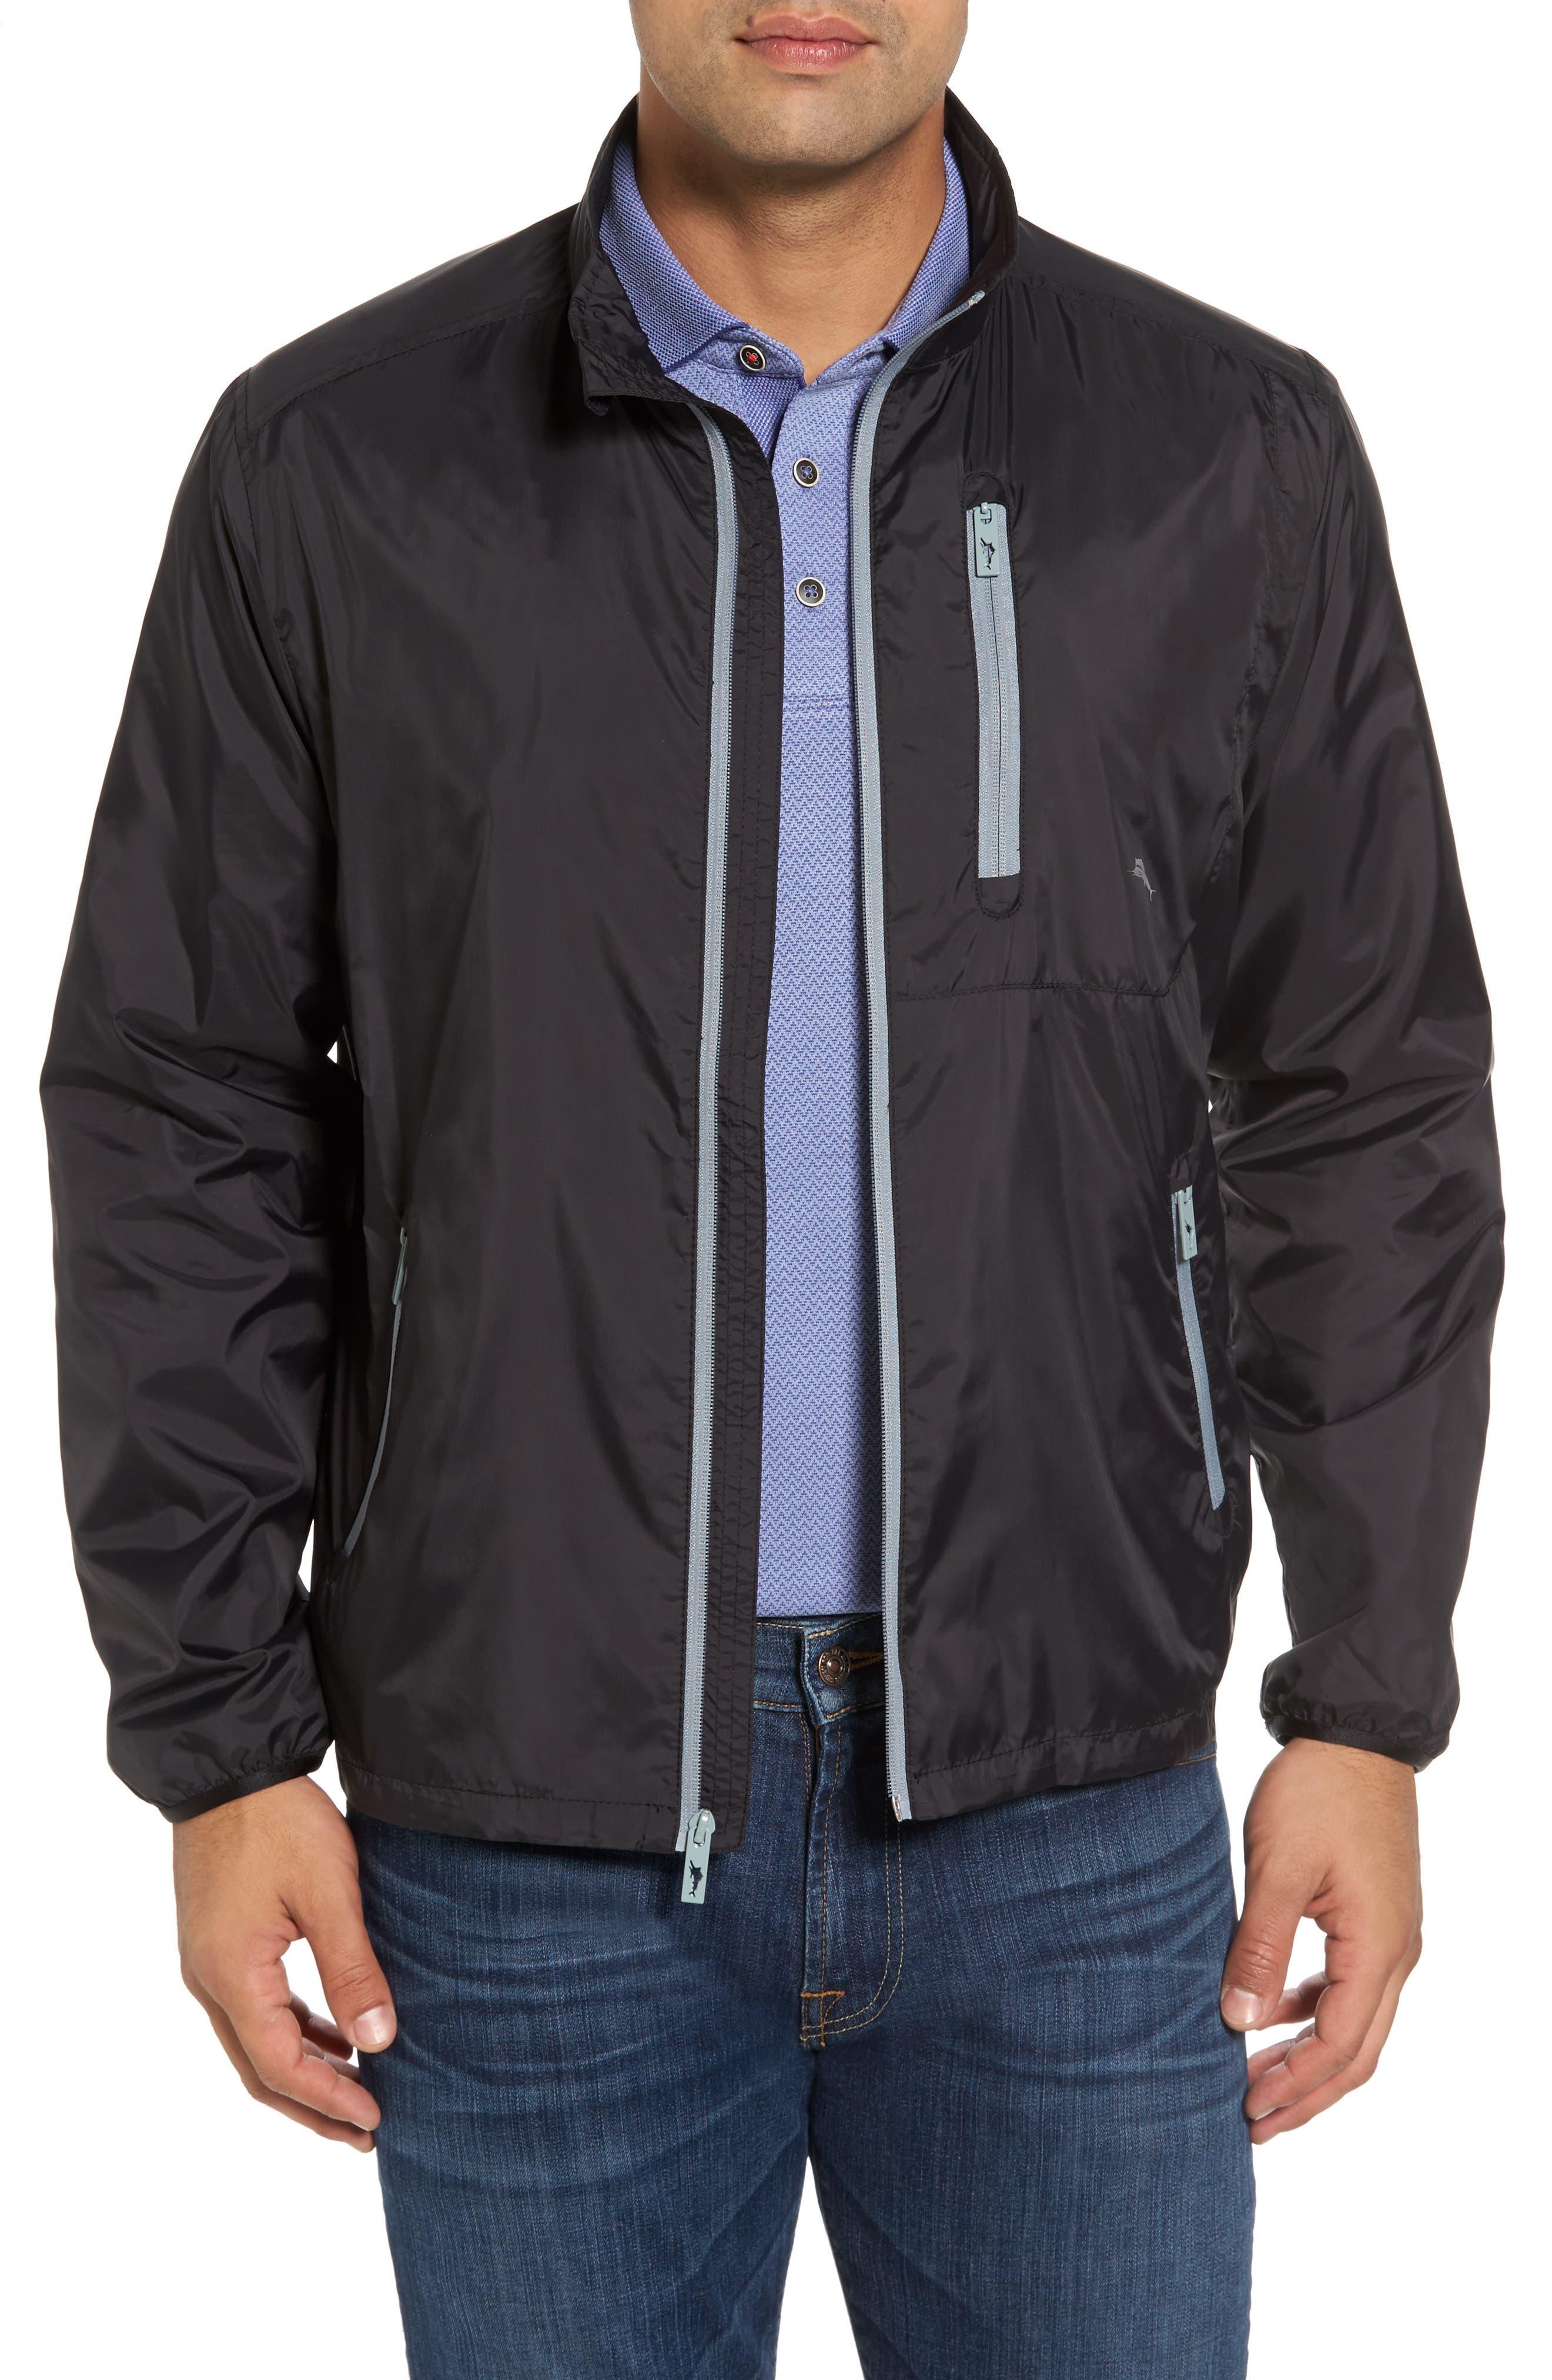 Nine Iron Water-Repellent Jacket,                         Main,                         color, Black